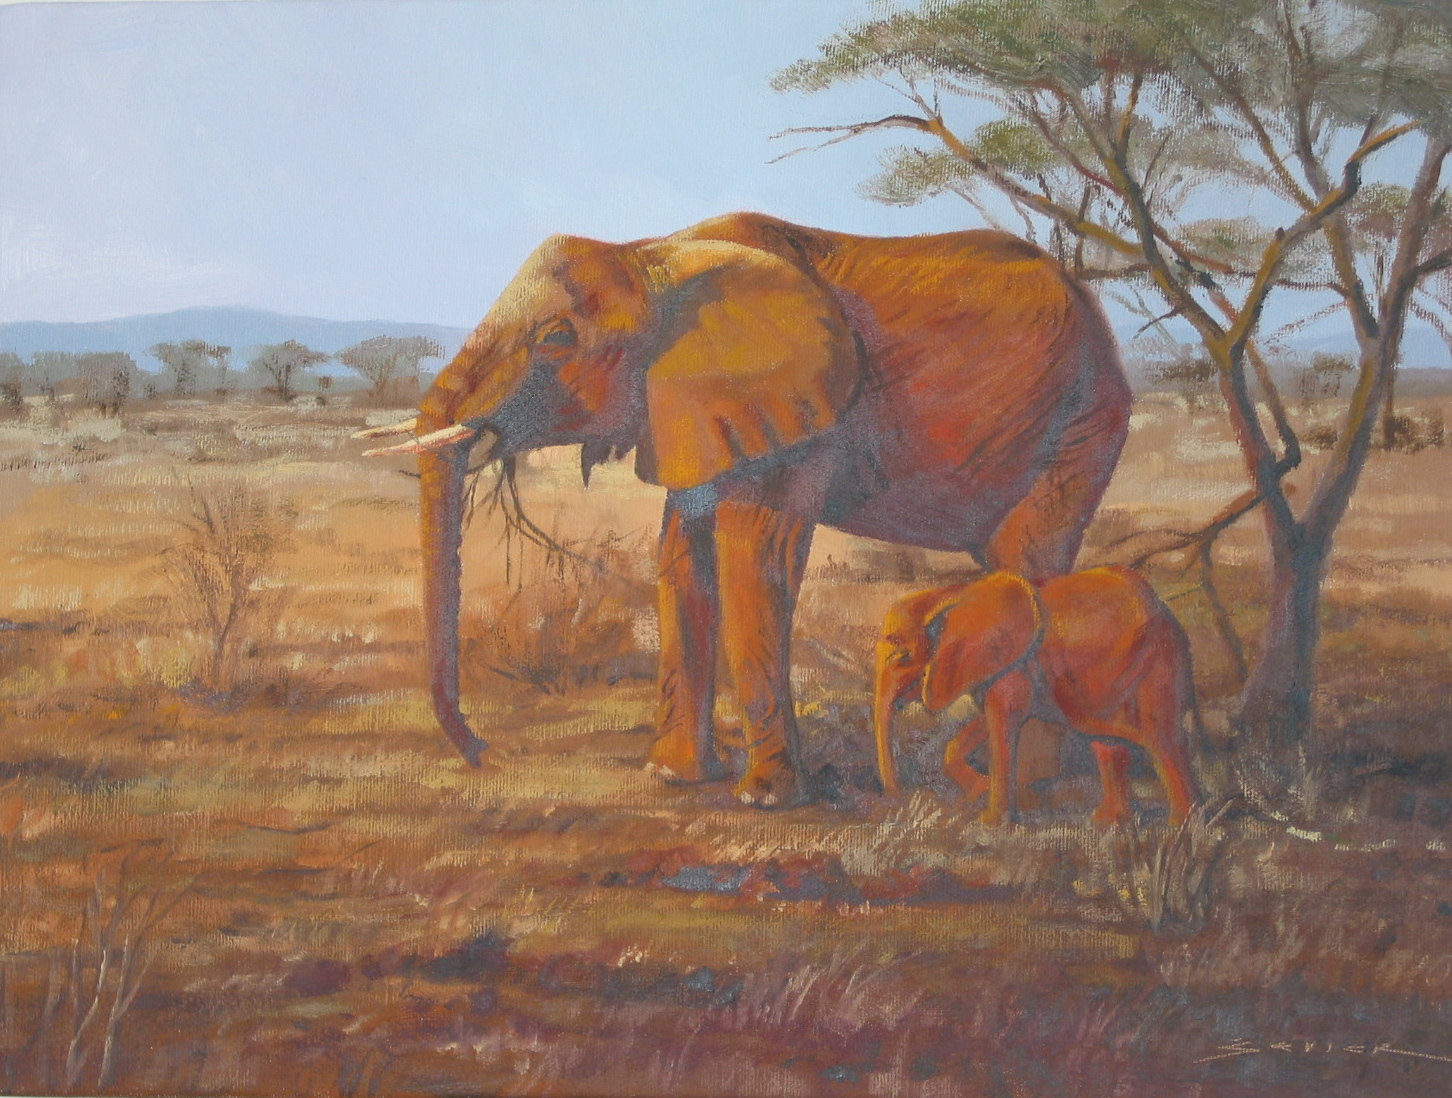 Elephants, Samburu,Kenya, 12 x 16